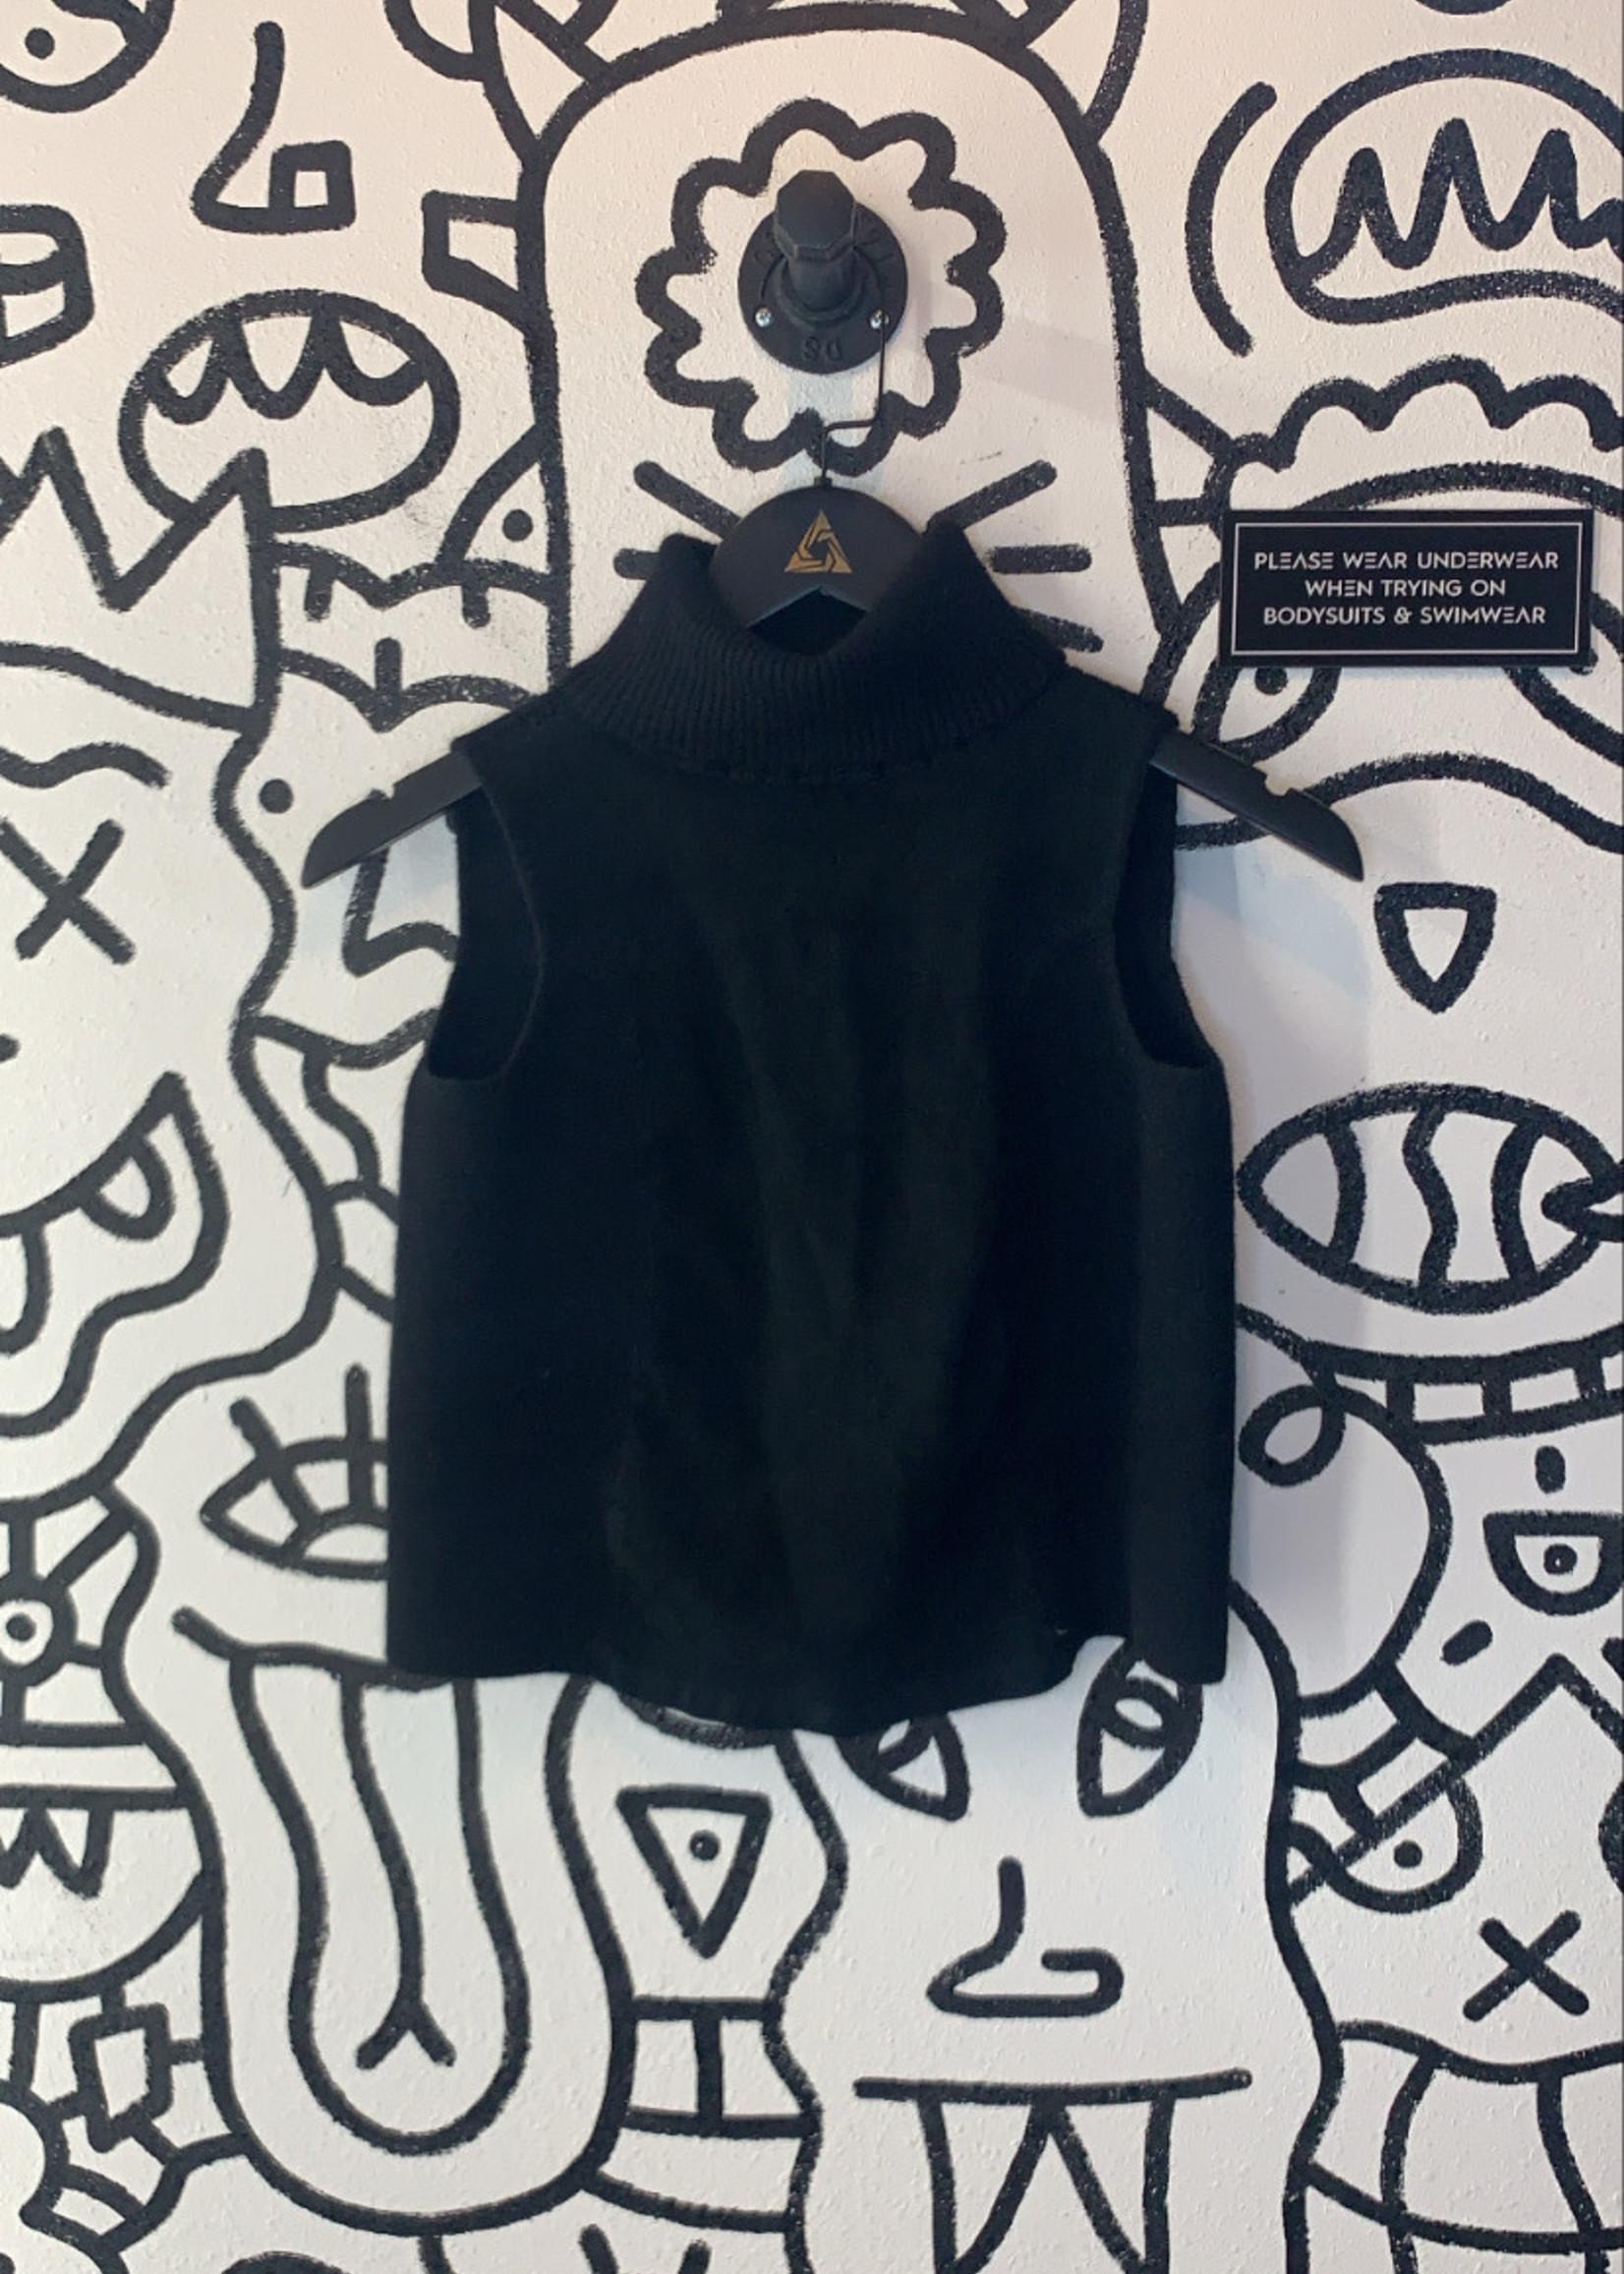 DKNY Knit sleeveless turtleneck S